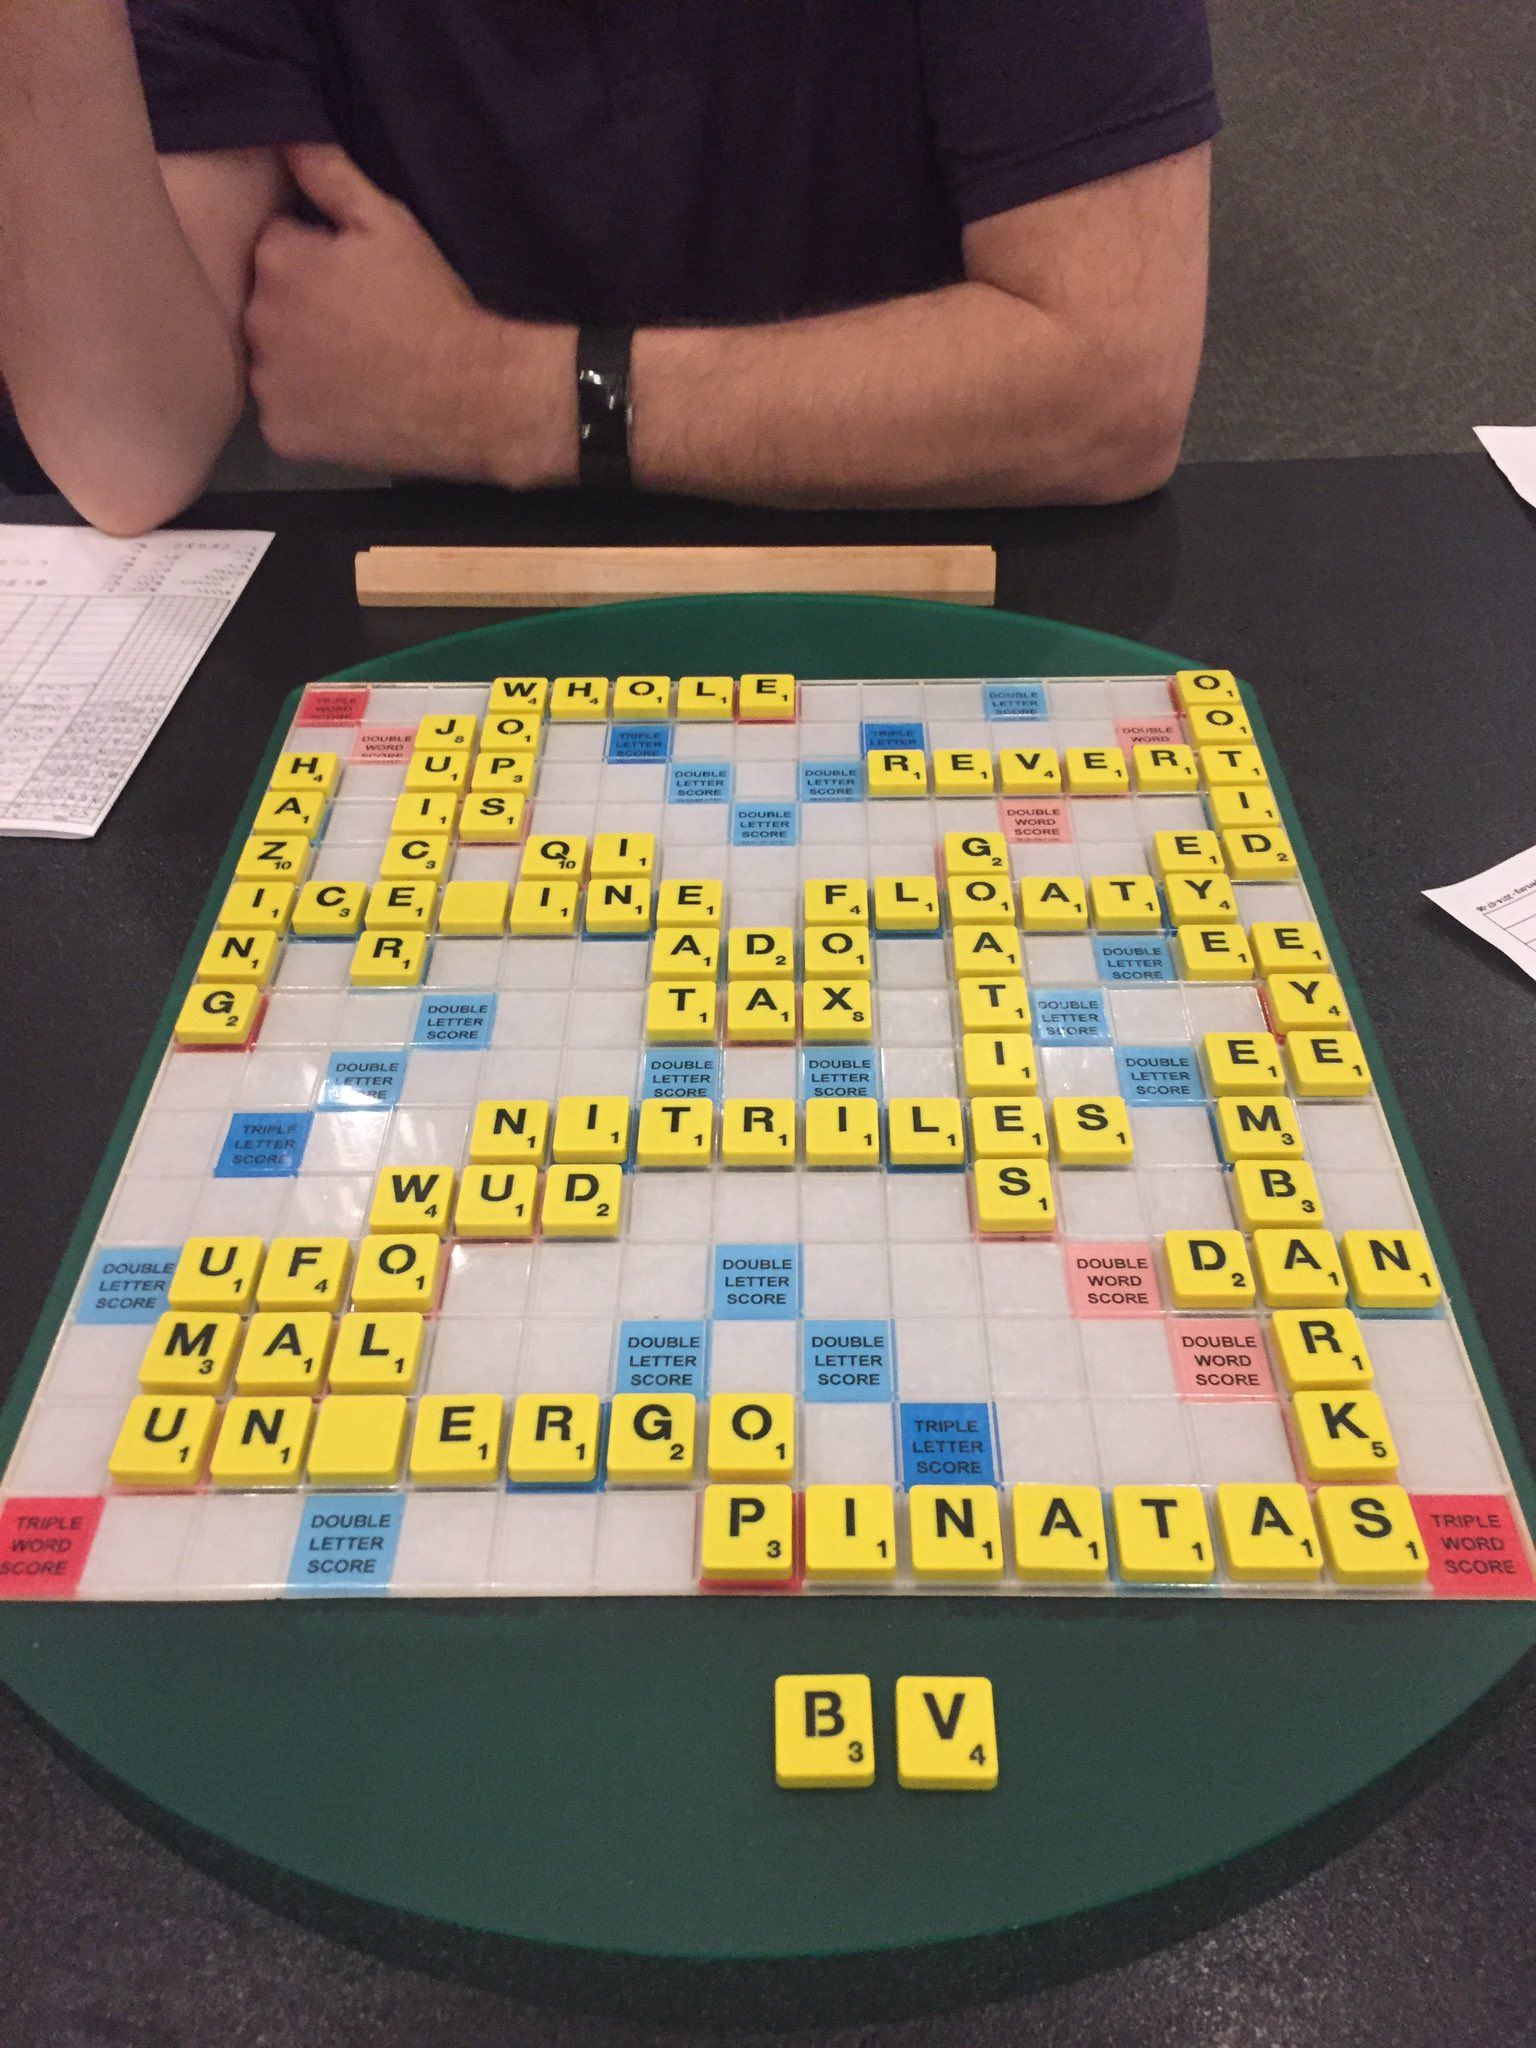 Thumbnail for Niagara Falls Scrabble Tournament Day 2